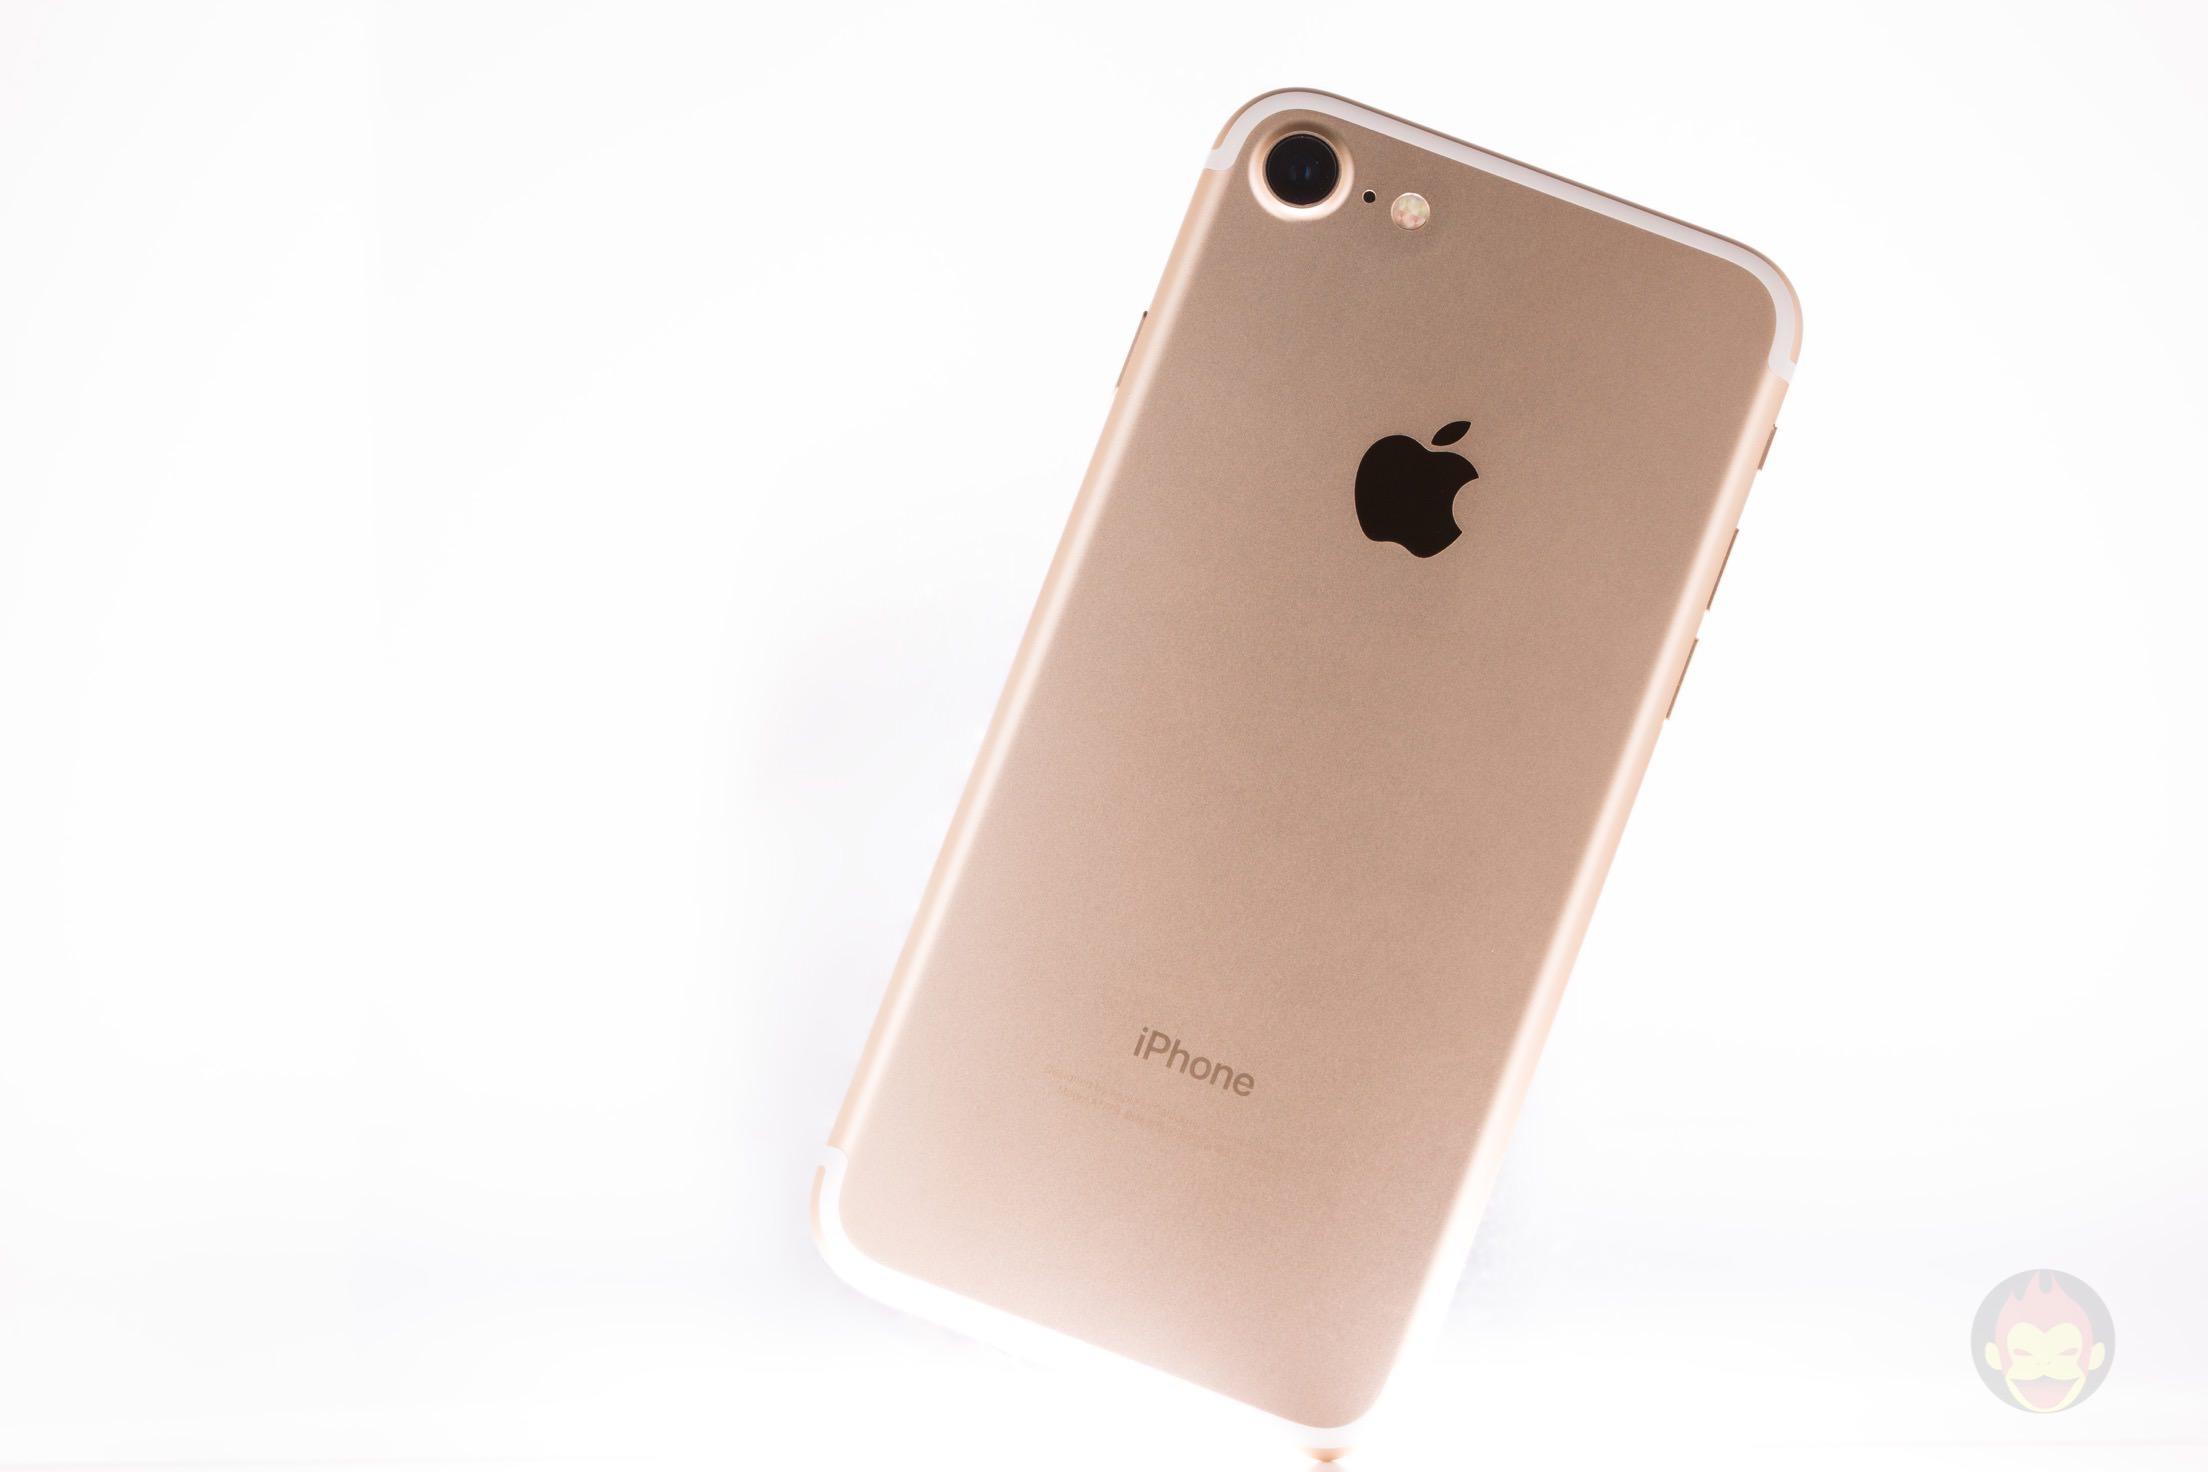 iPhone-7-Gold-Model-07.jpg